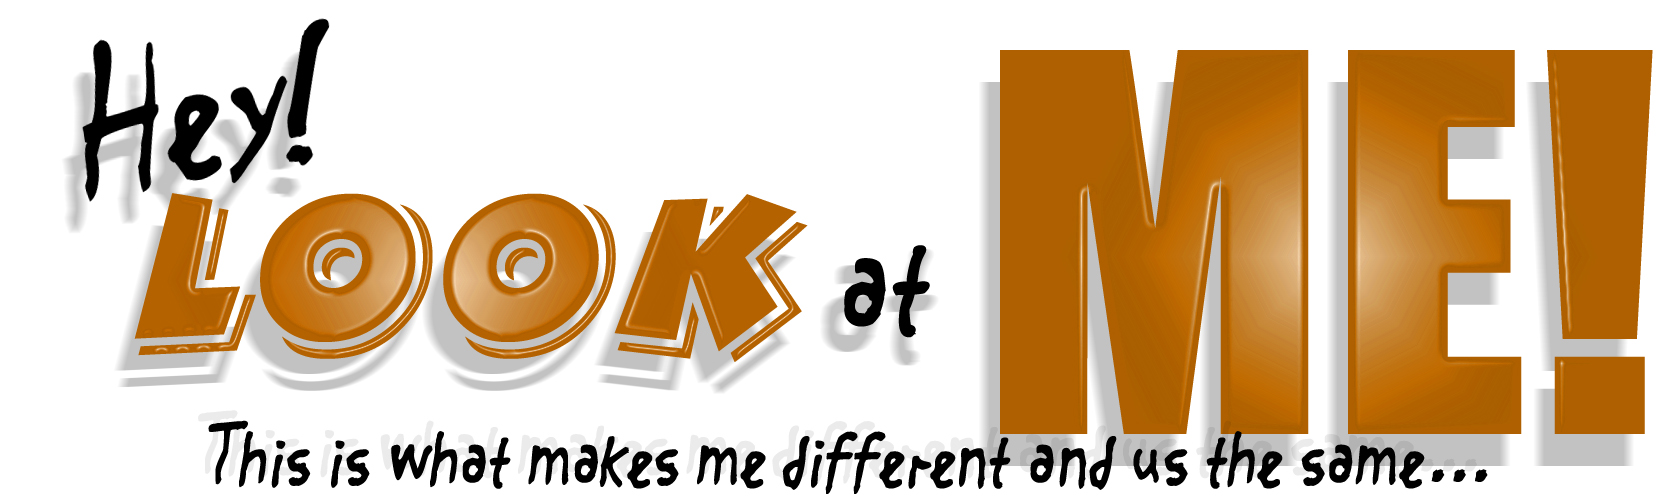 LOOK at ME logo 3.jpg